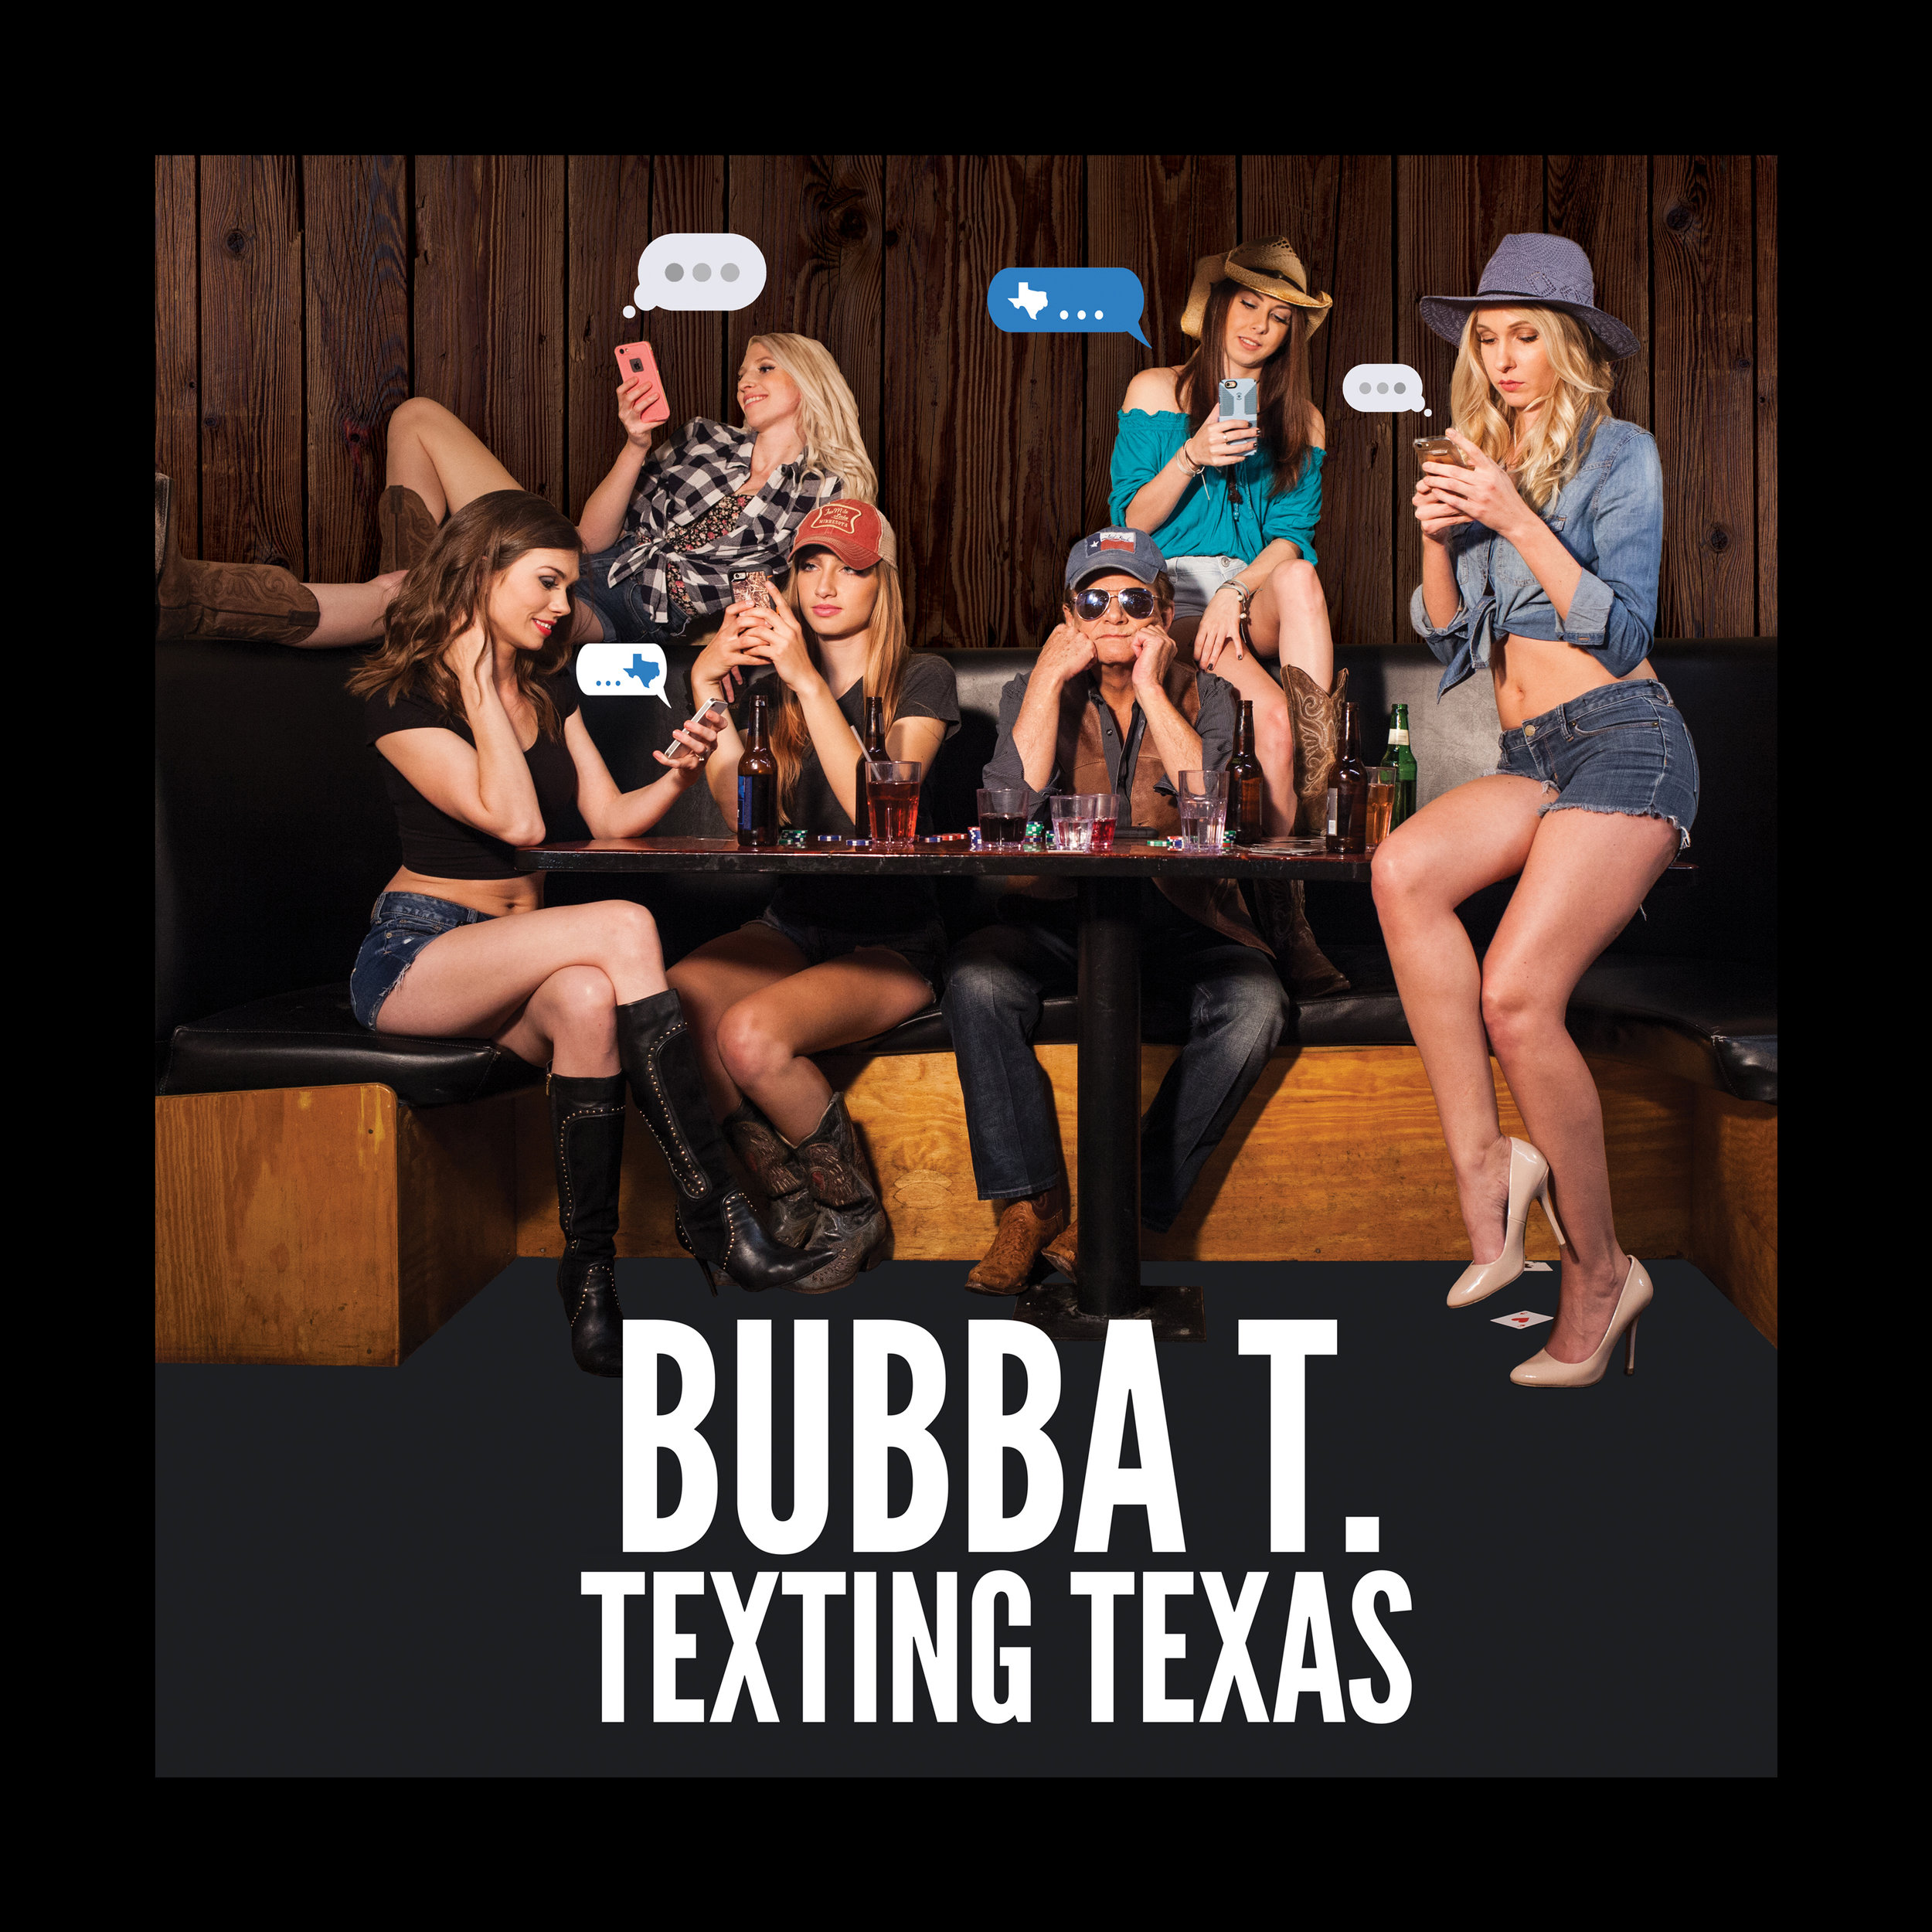 Texting Texas